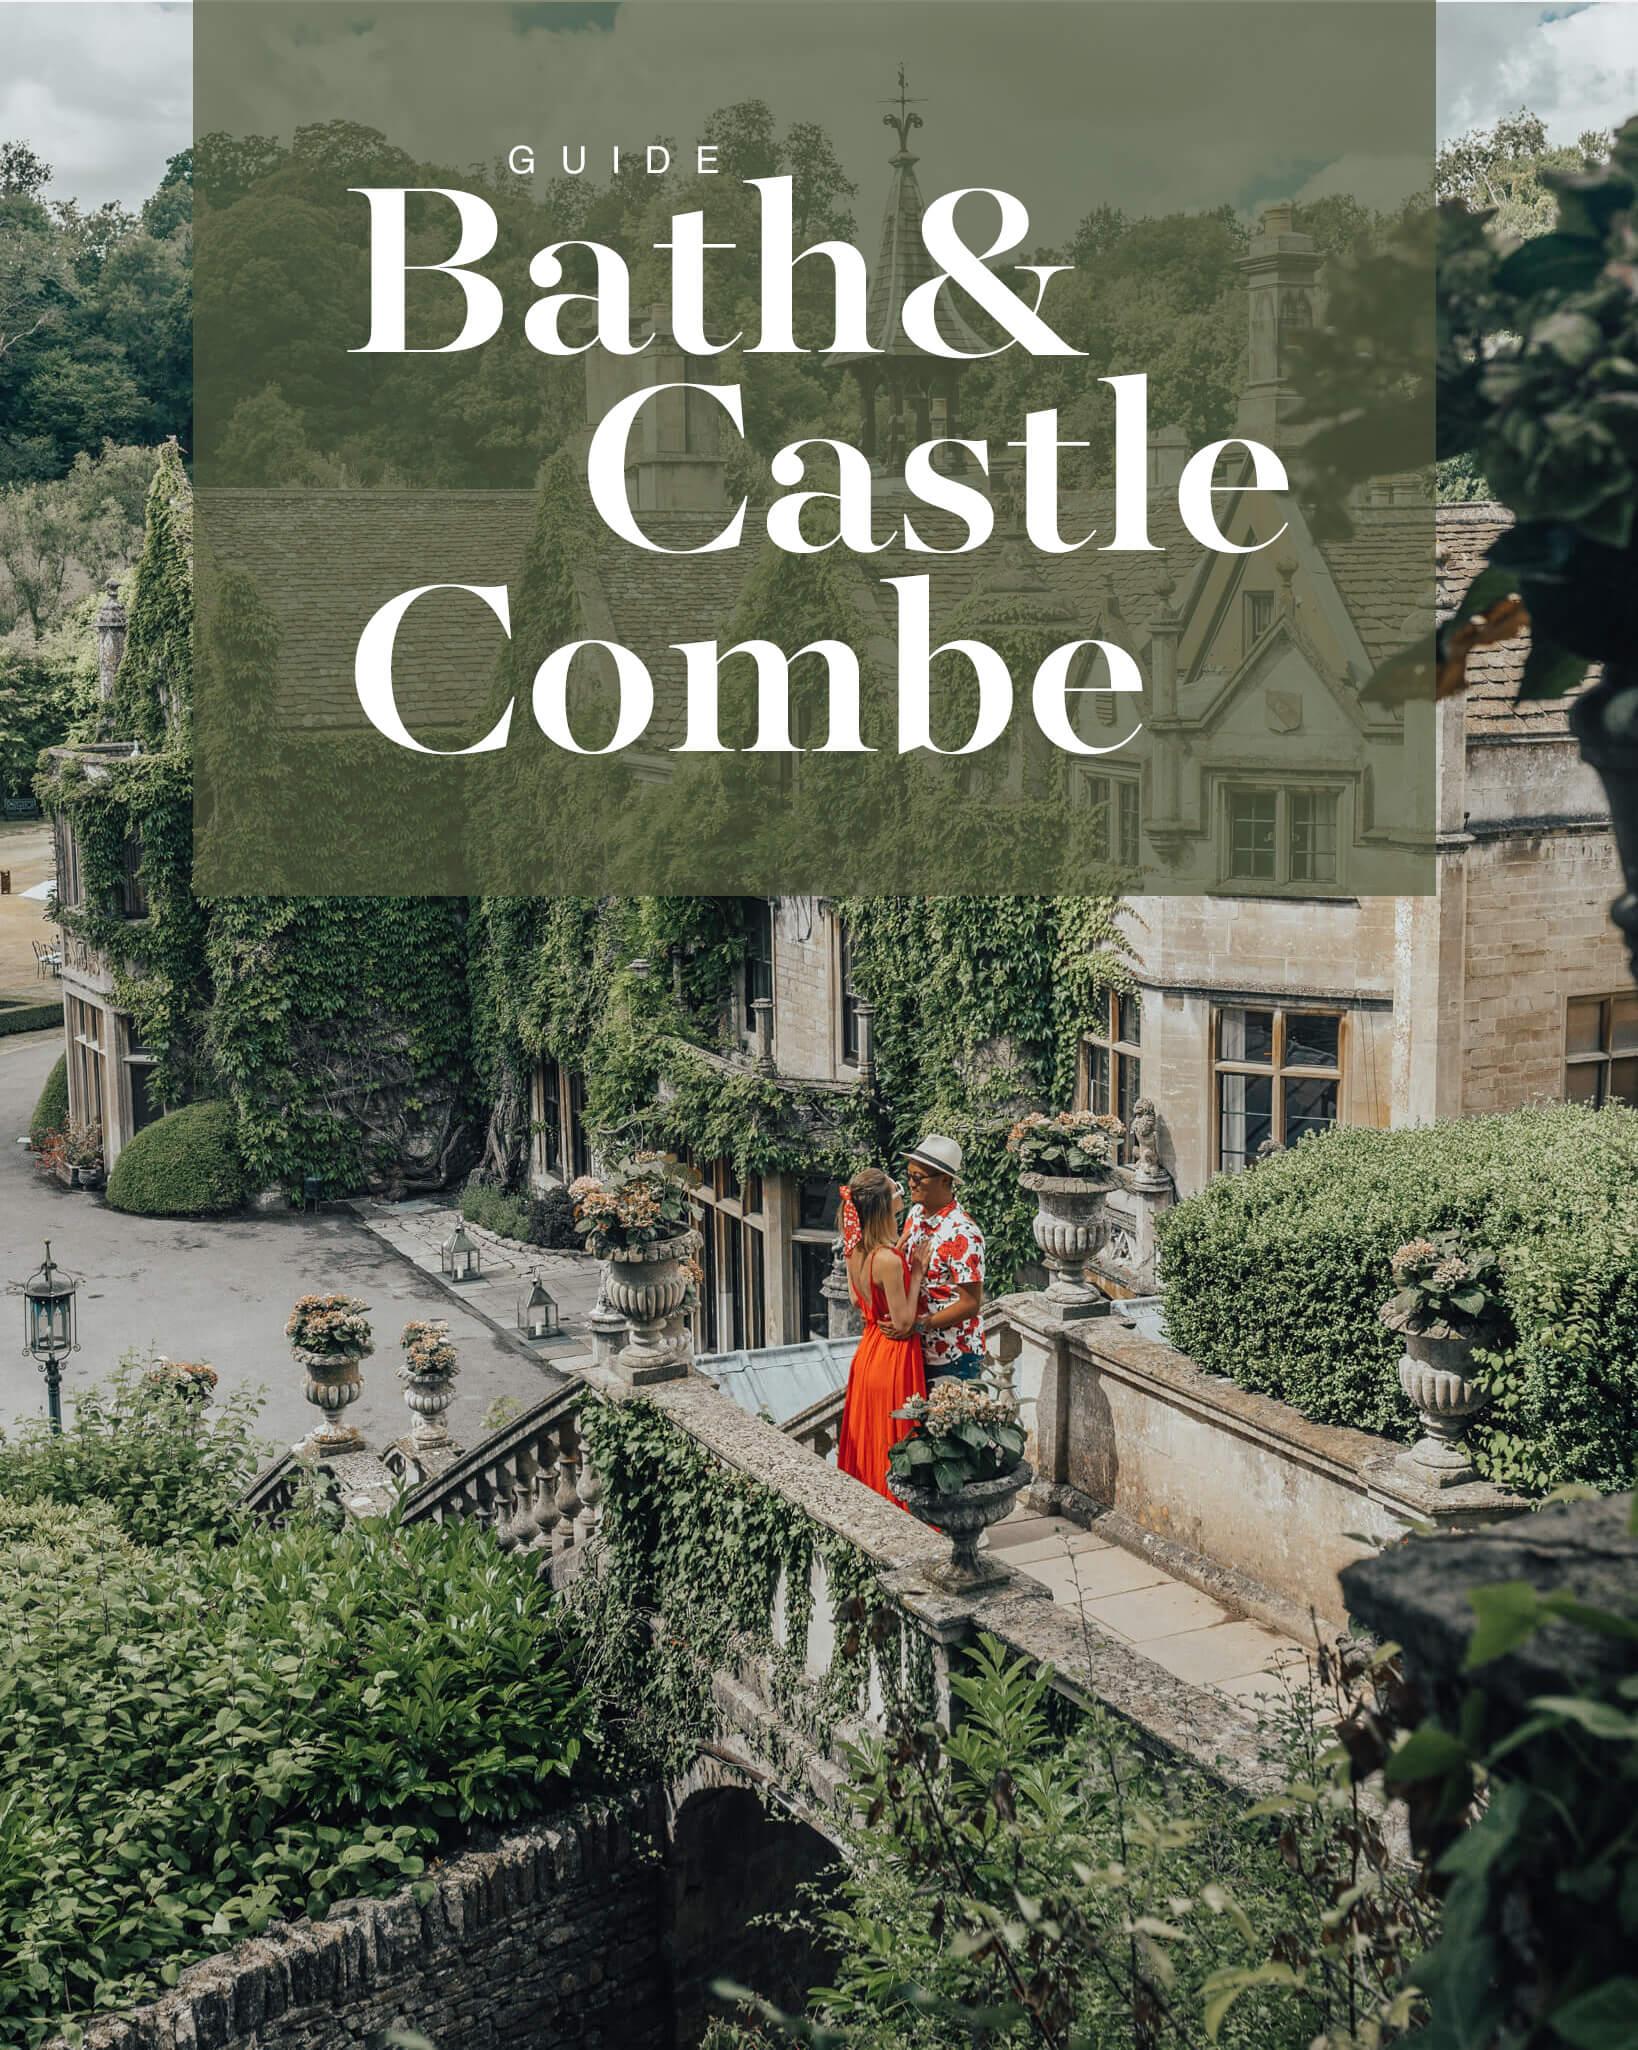 Bath-CastleCombe-Guide-Cover.jpg